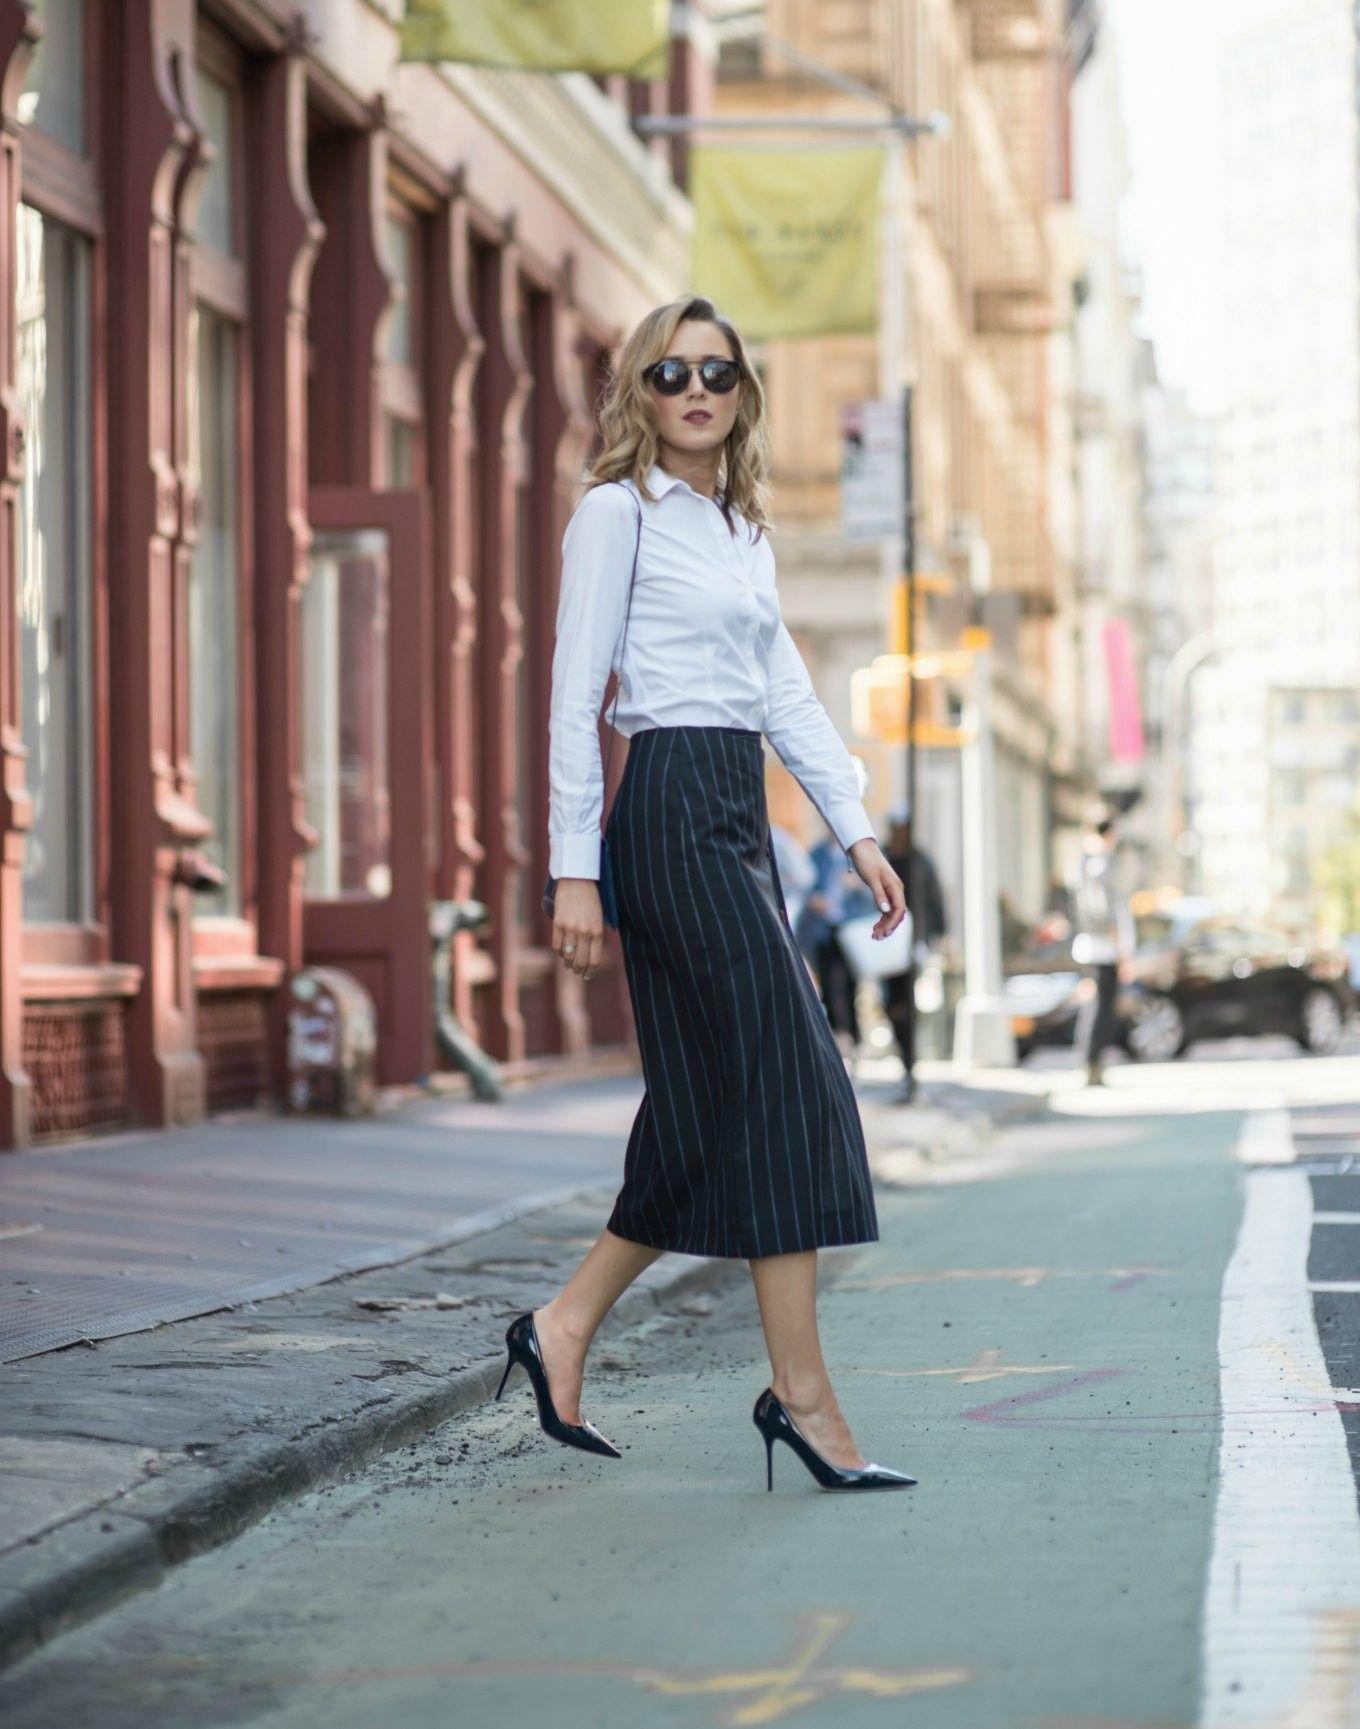 87bb8e68a644ef navy-pinstripe-midi-pencil-skirt-collared-button-down-shirt -jimmy-choo-classic-pumps-work-office-wear-style-fashion-blog3